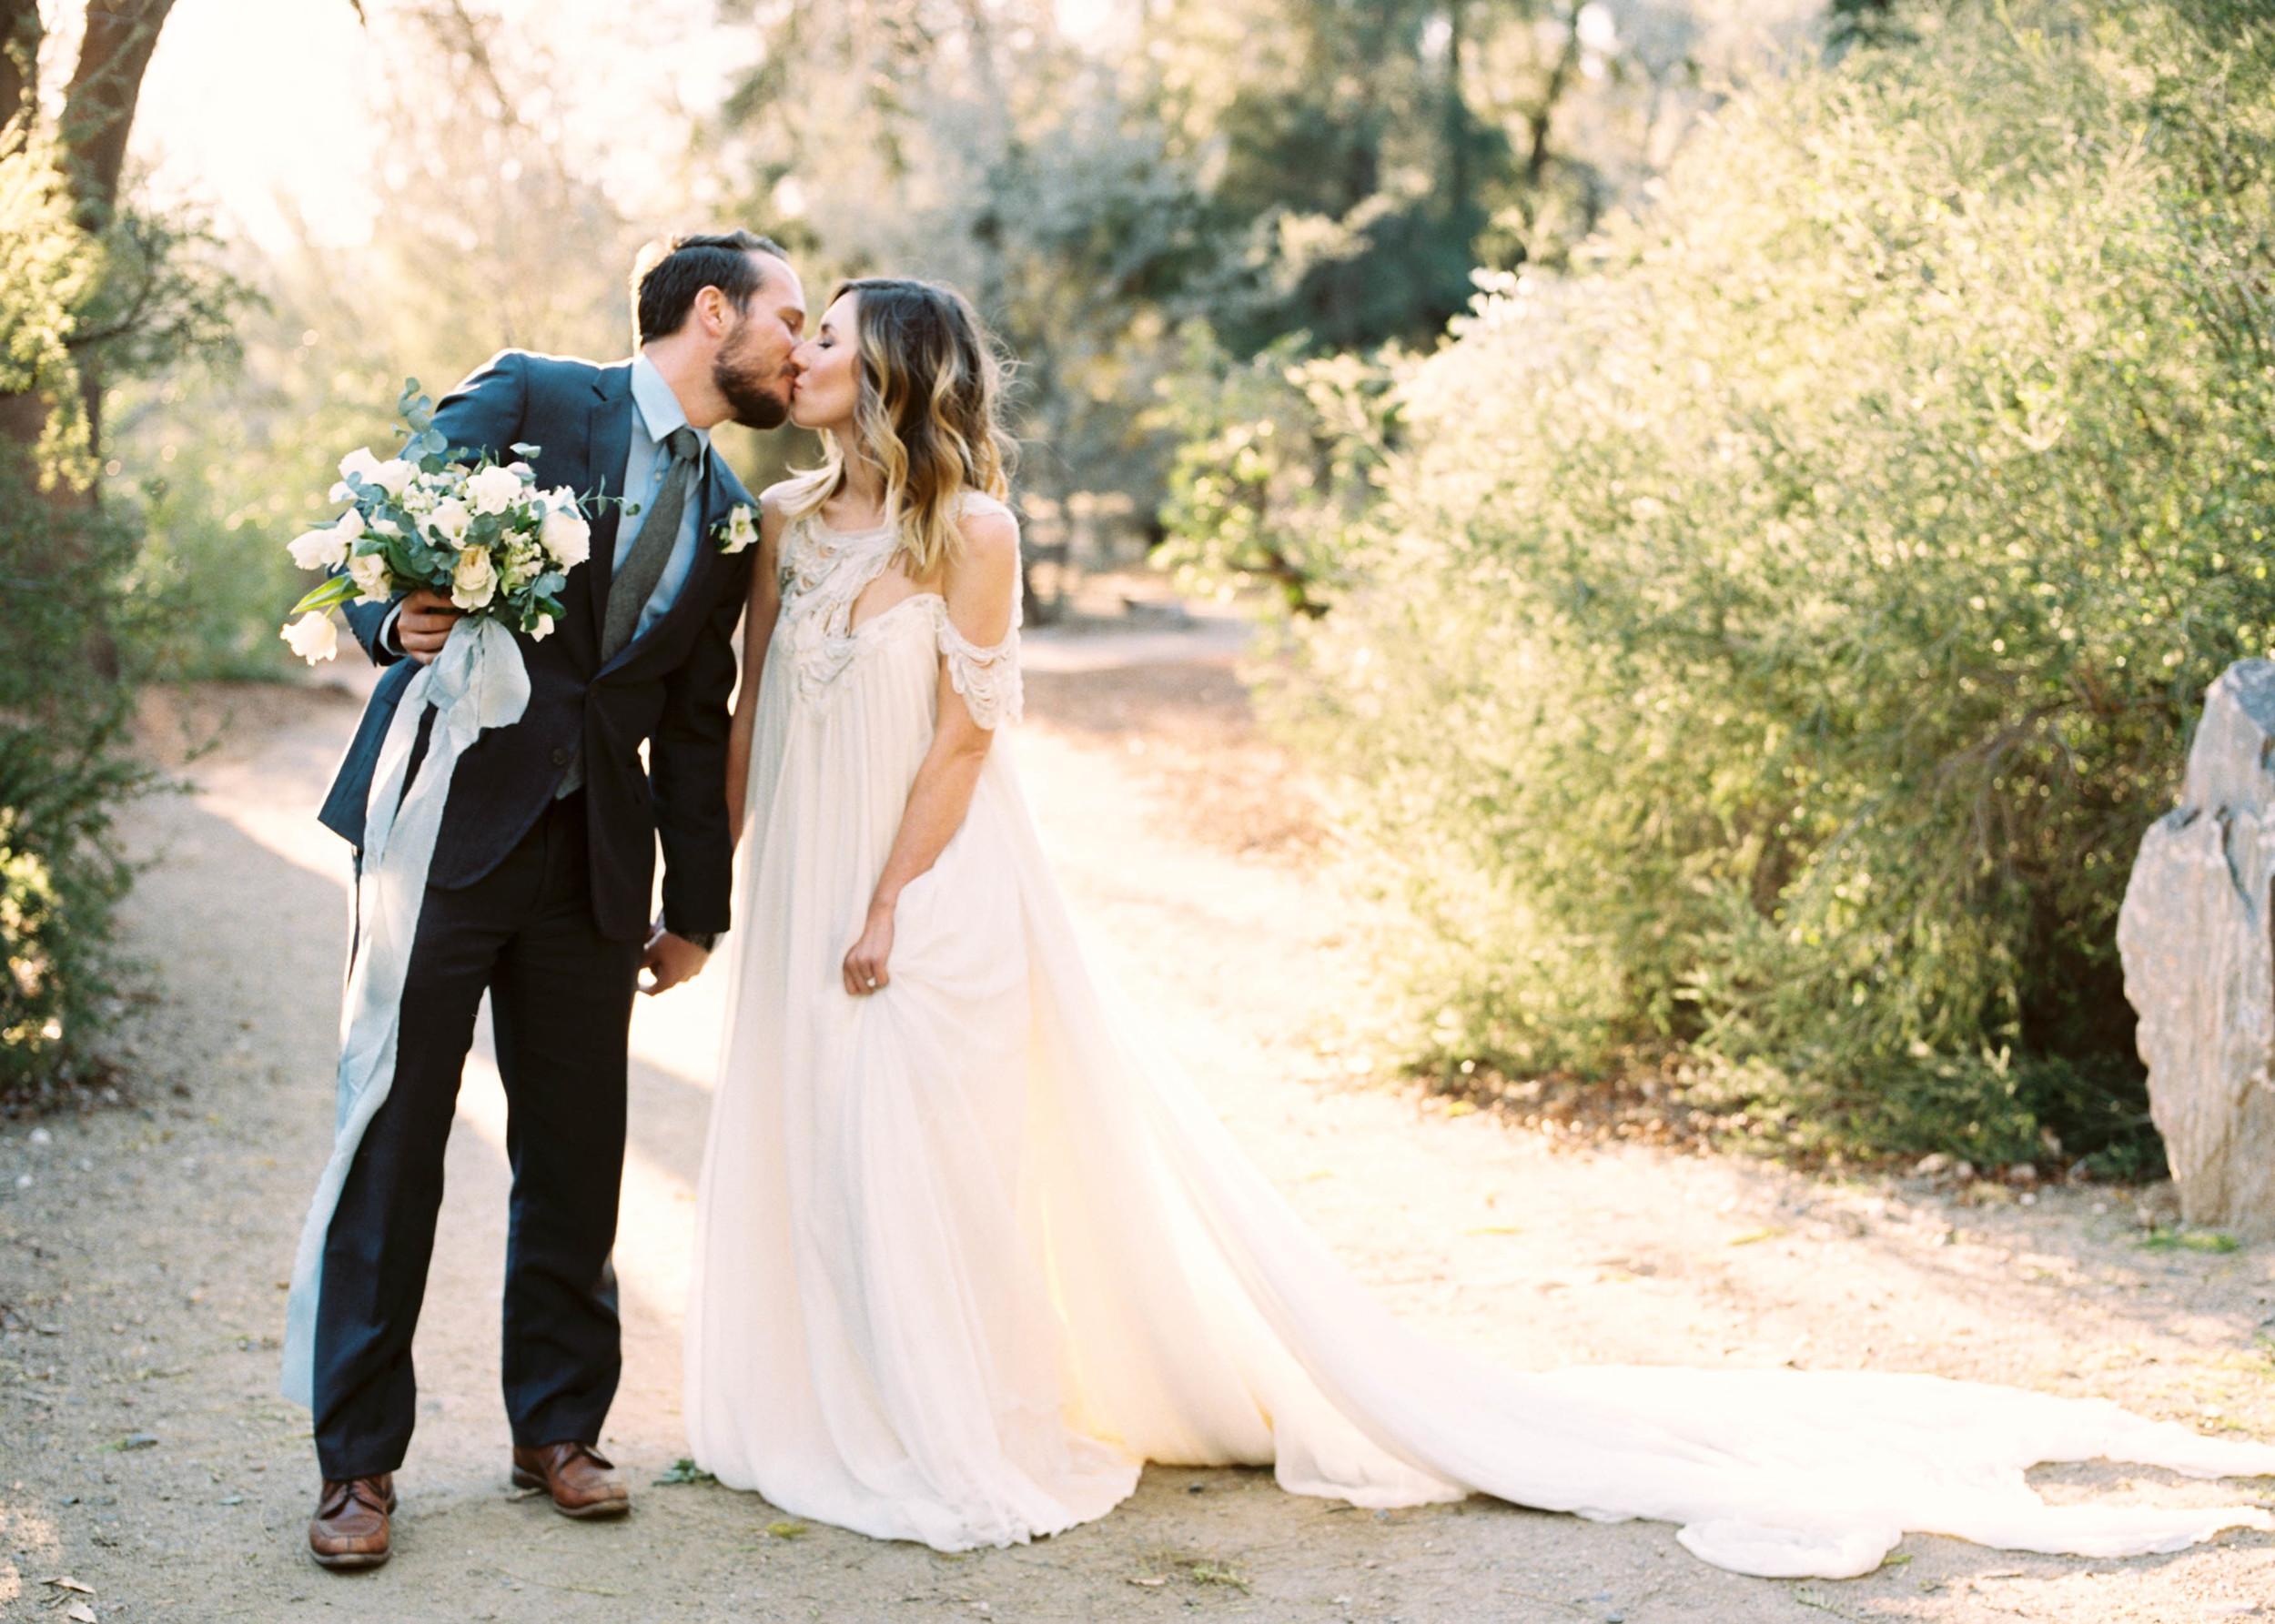 Danford-Photography-Bozeman-Montana-Arizona-Fine Art Film-Wedding-Engagement-Photographers-14.jpg